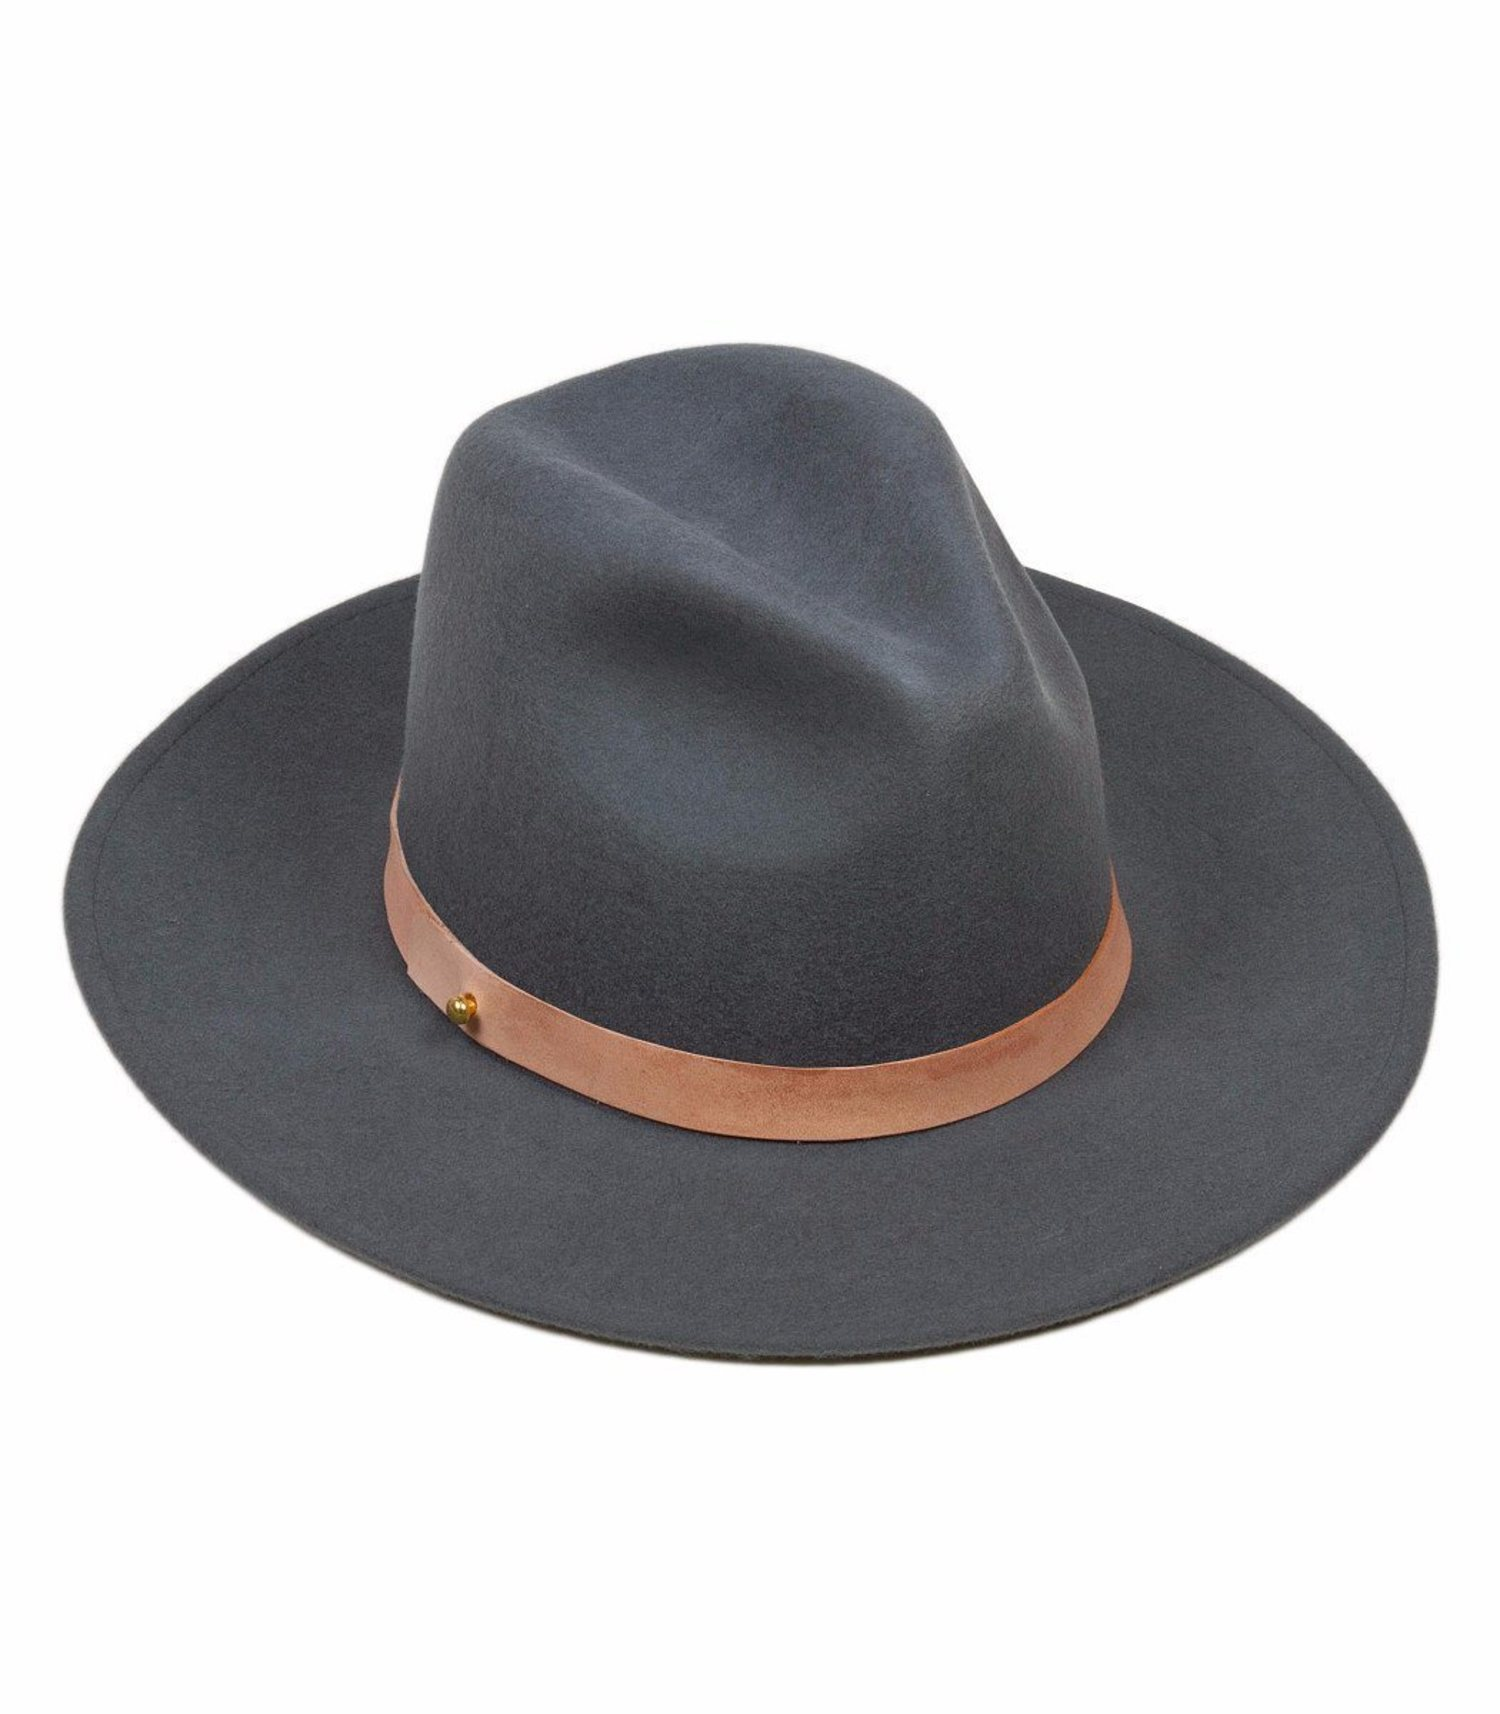 Sombrero de lana australiana.